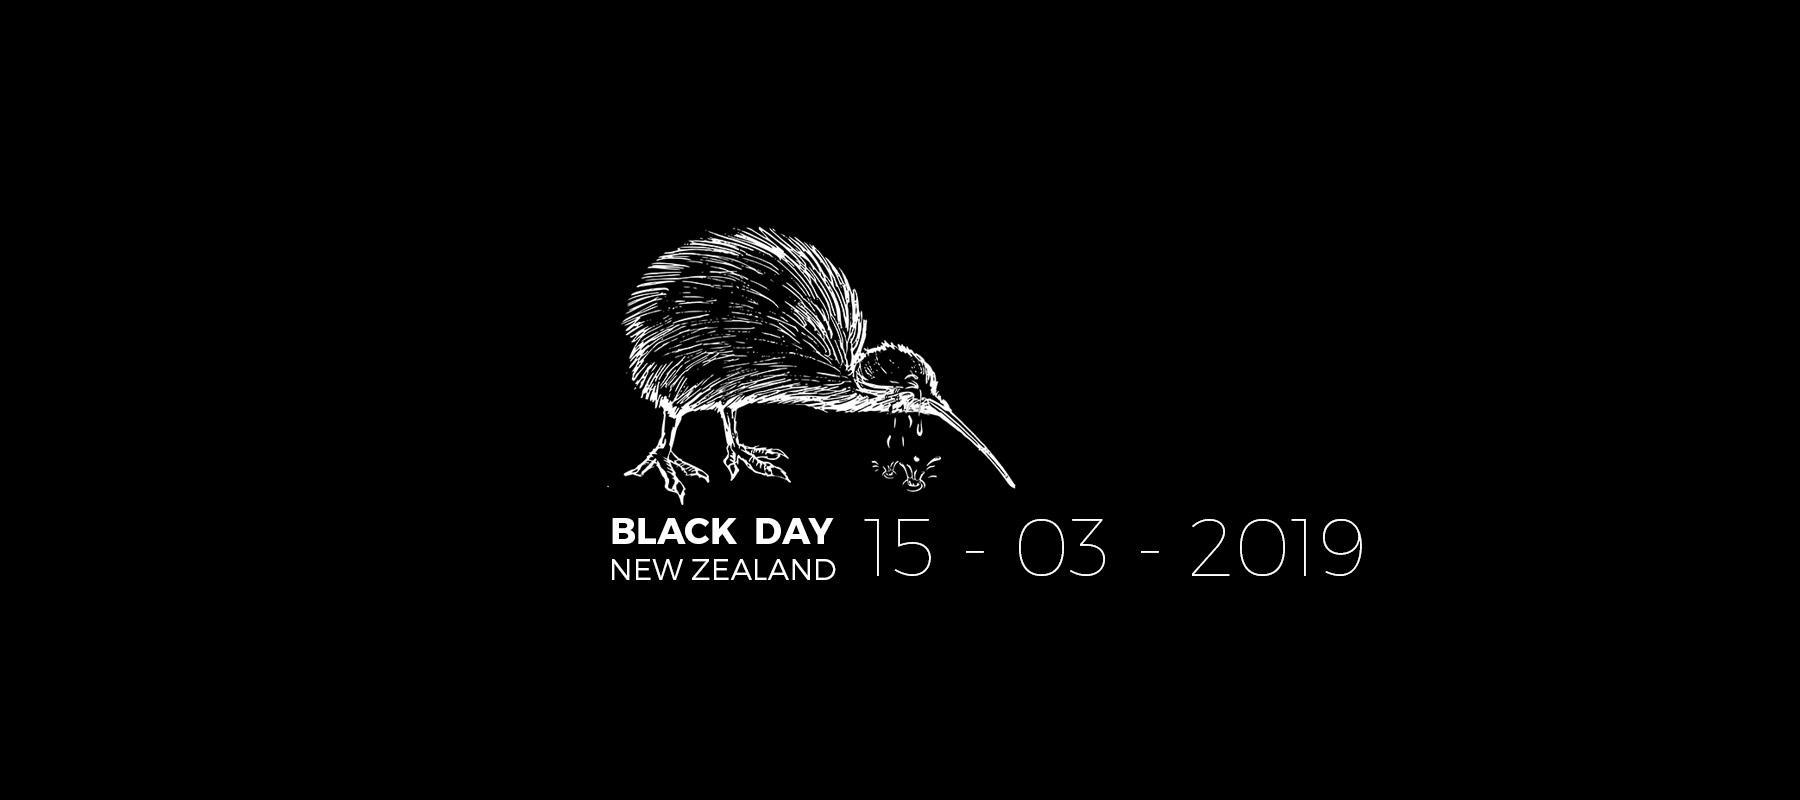 Black Day New Zealand